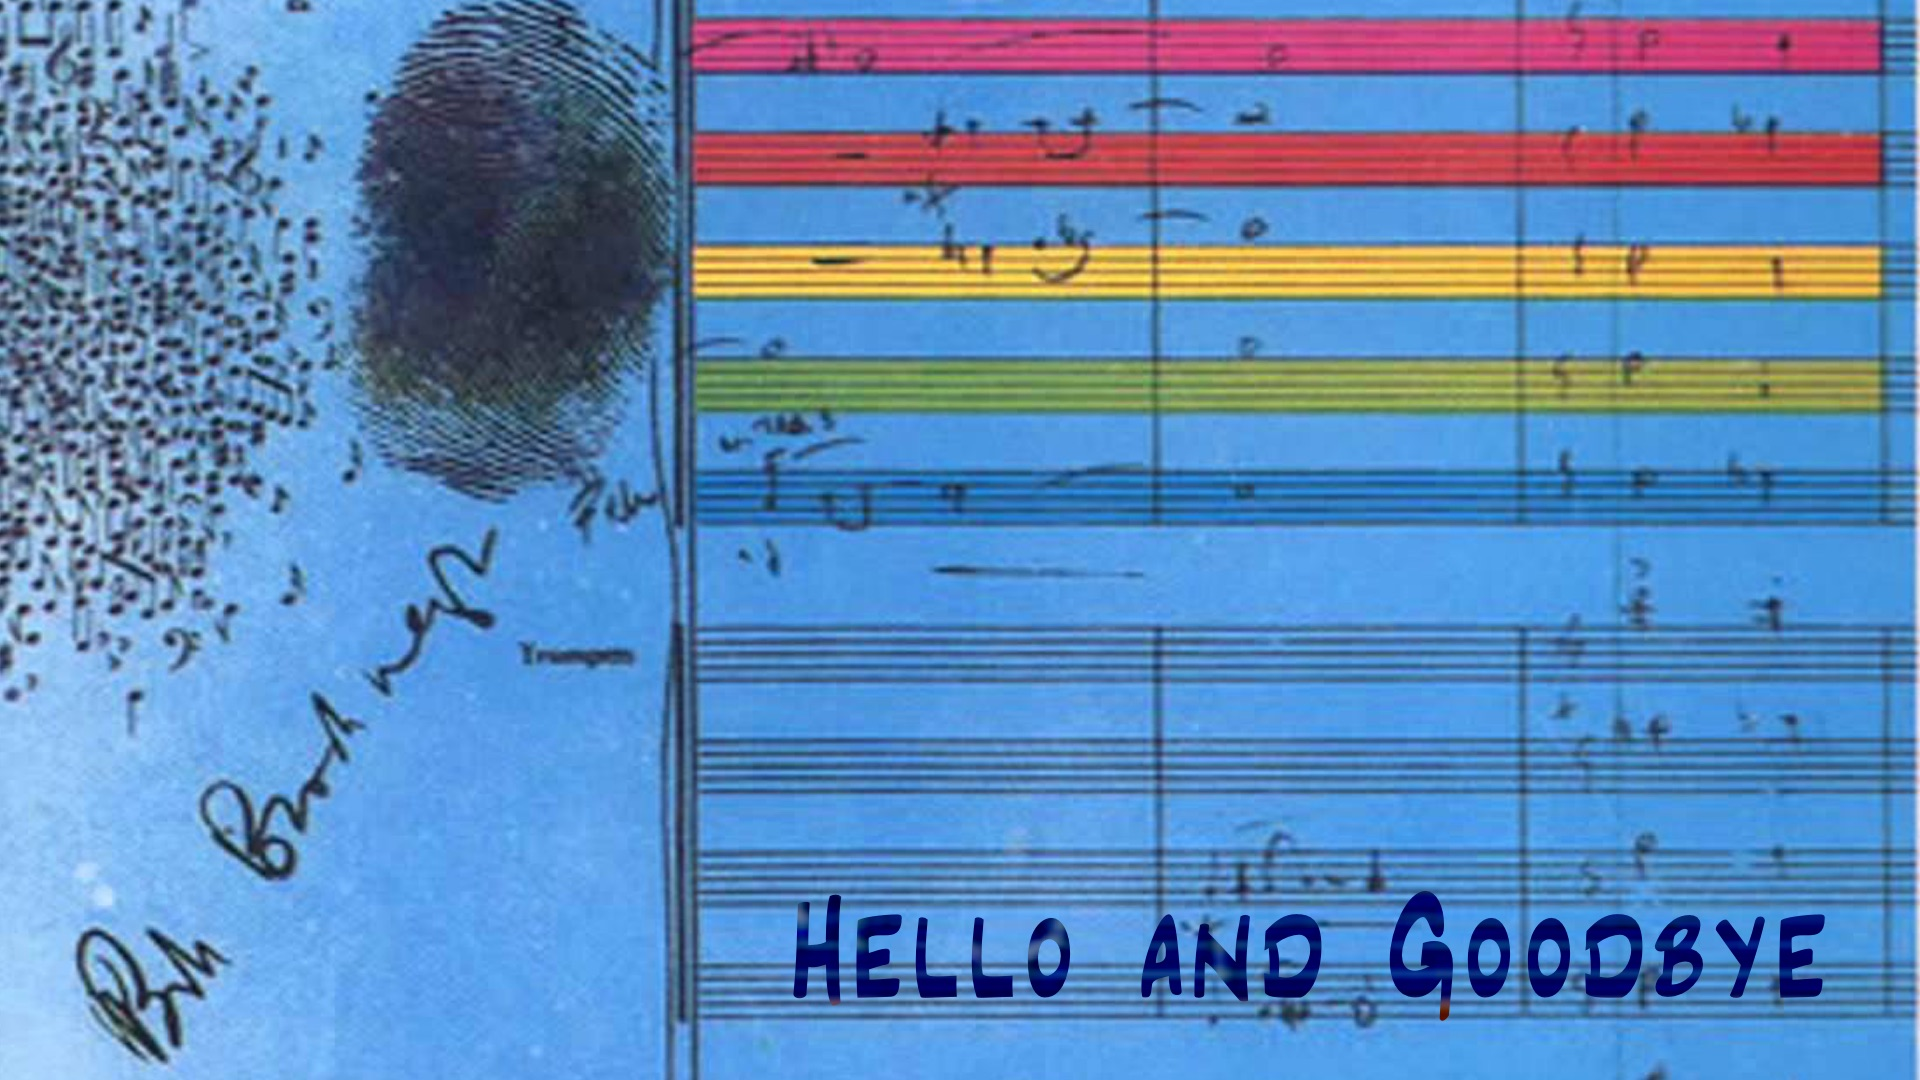 Ellington Hello and Goodbye